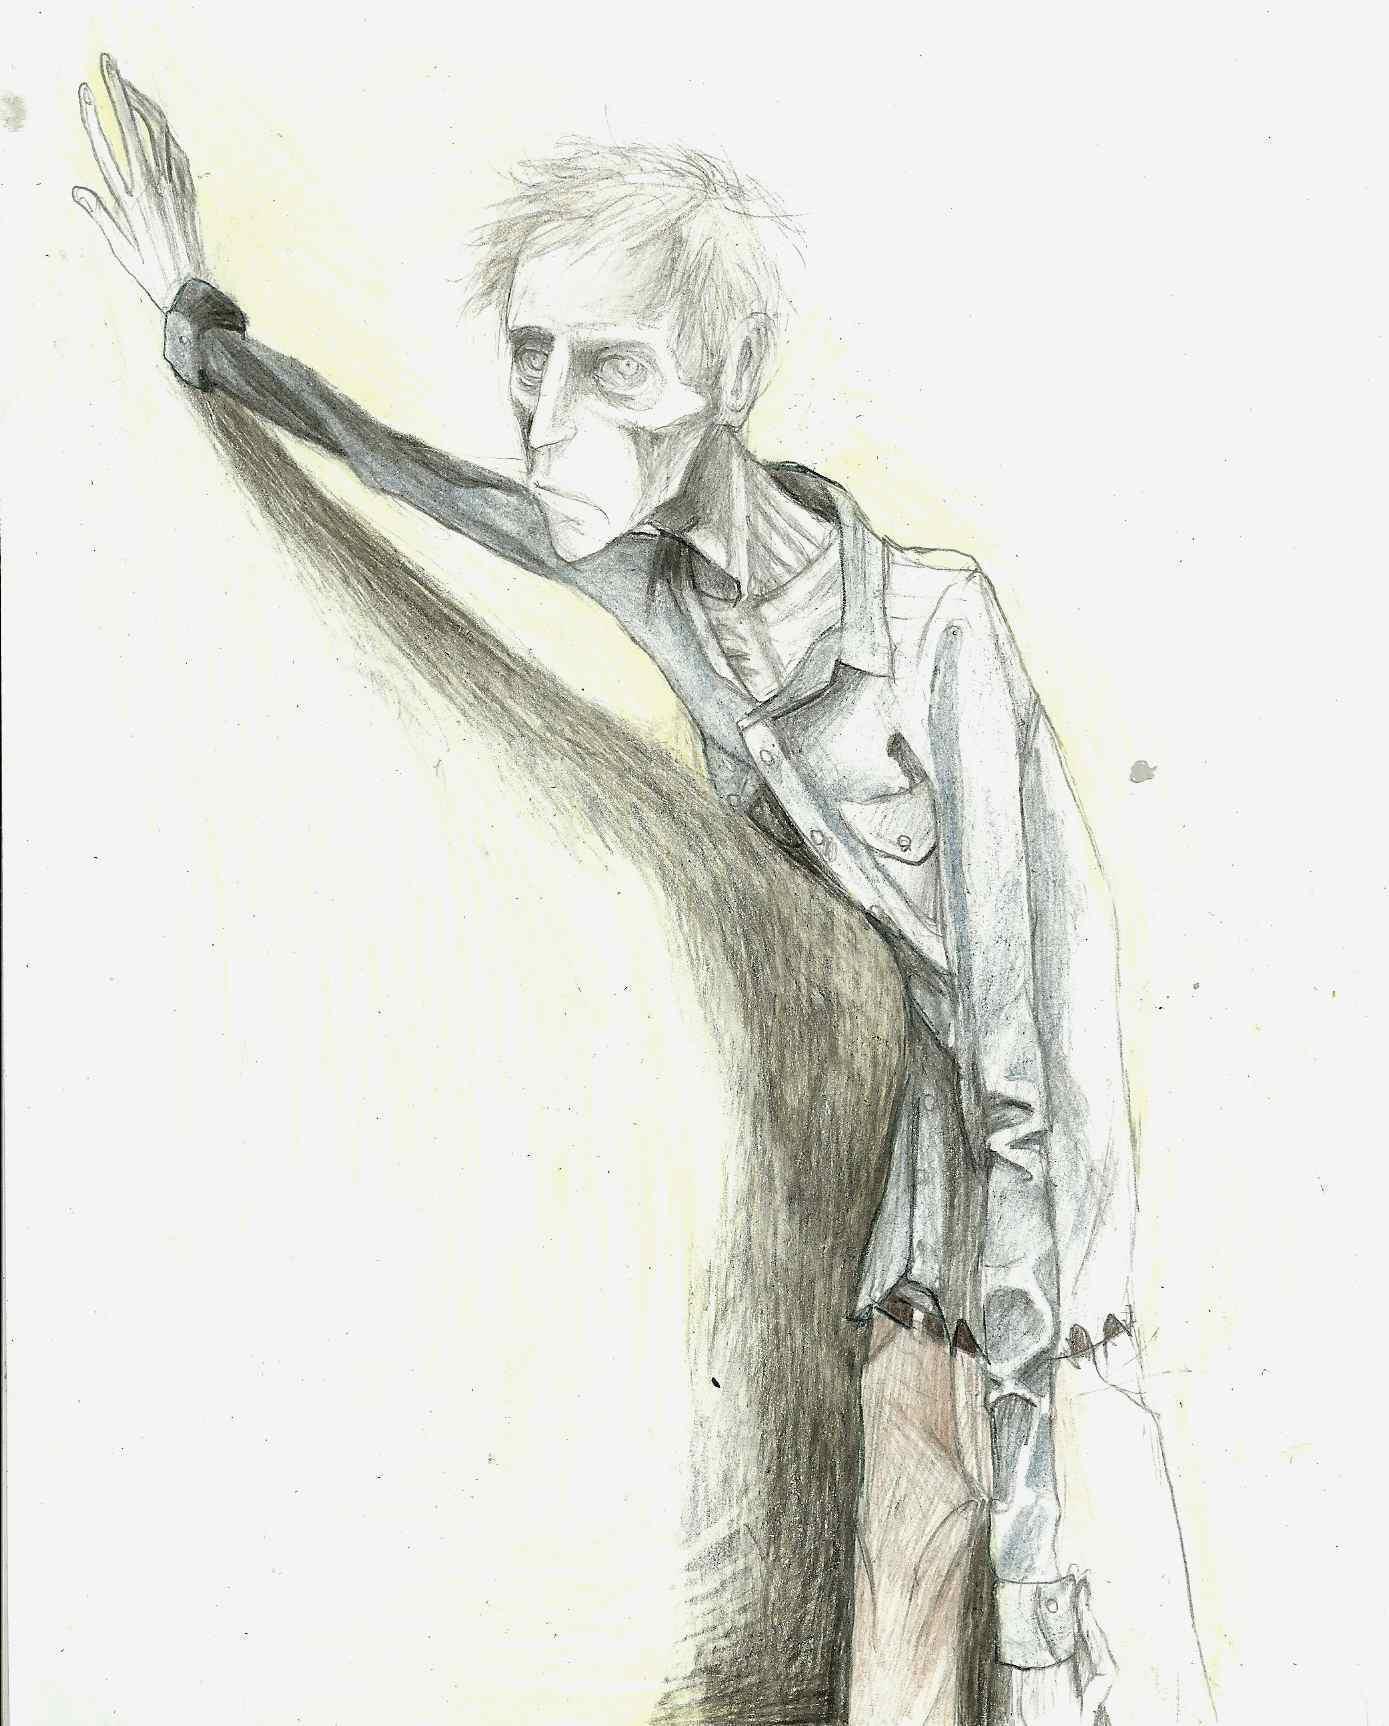 Boo Radley drawing